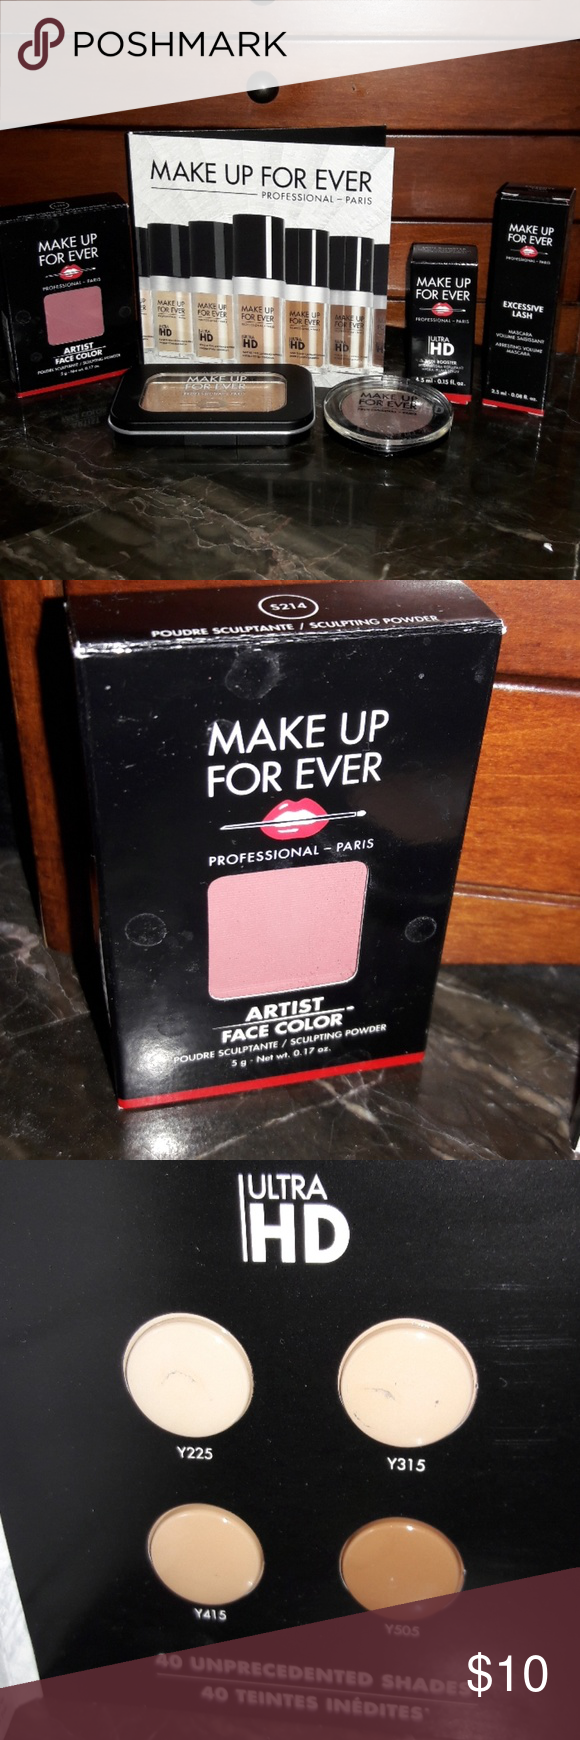 Sephora MUFE Sample Bundle Sephora makeup, All brands